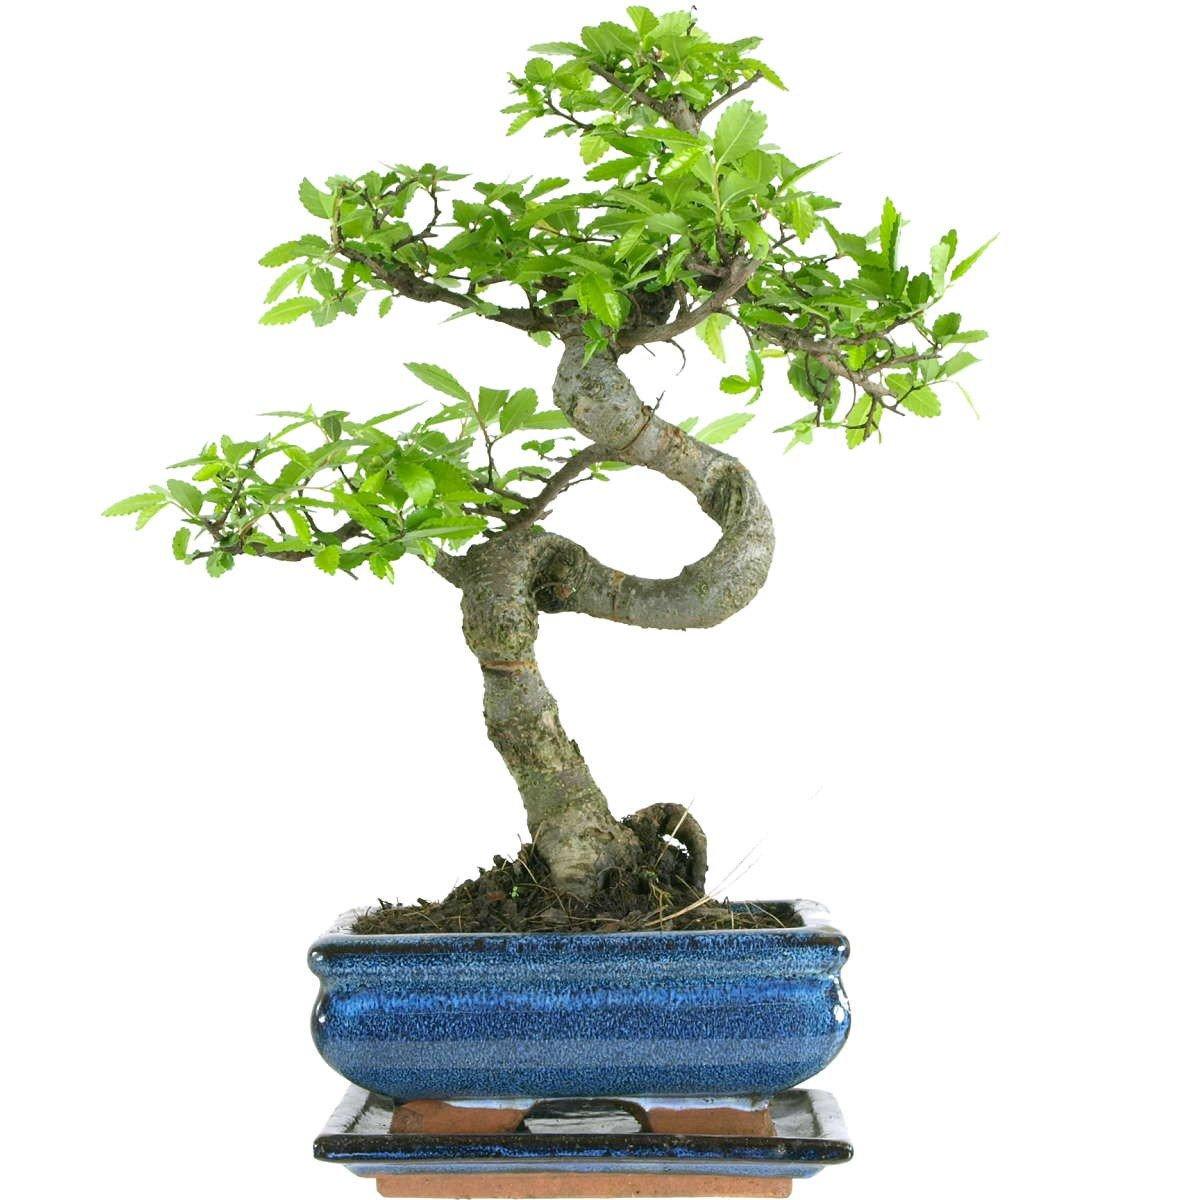 18cm Pot Indoor Bonsai Tree Gift Set Medium Sized Chinese Elm Bonsai